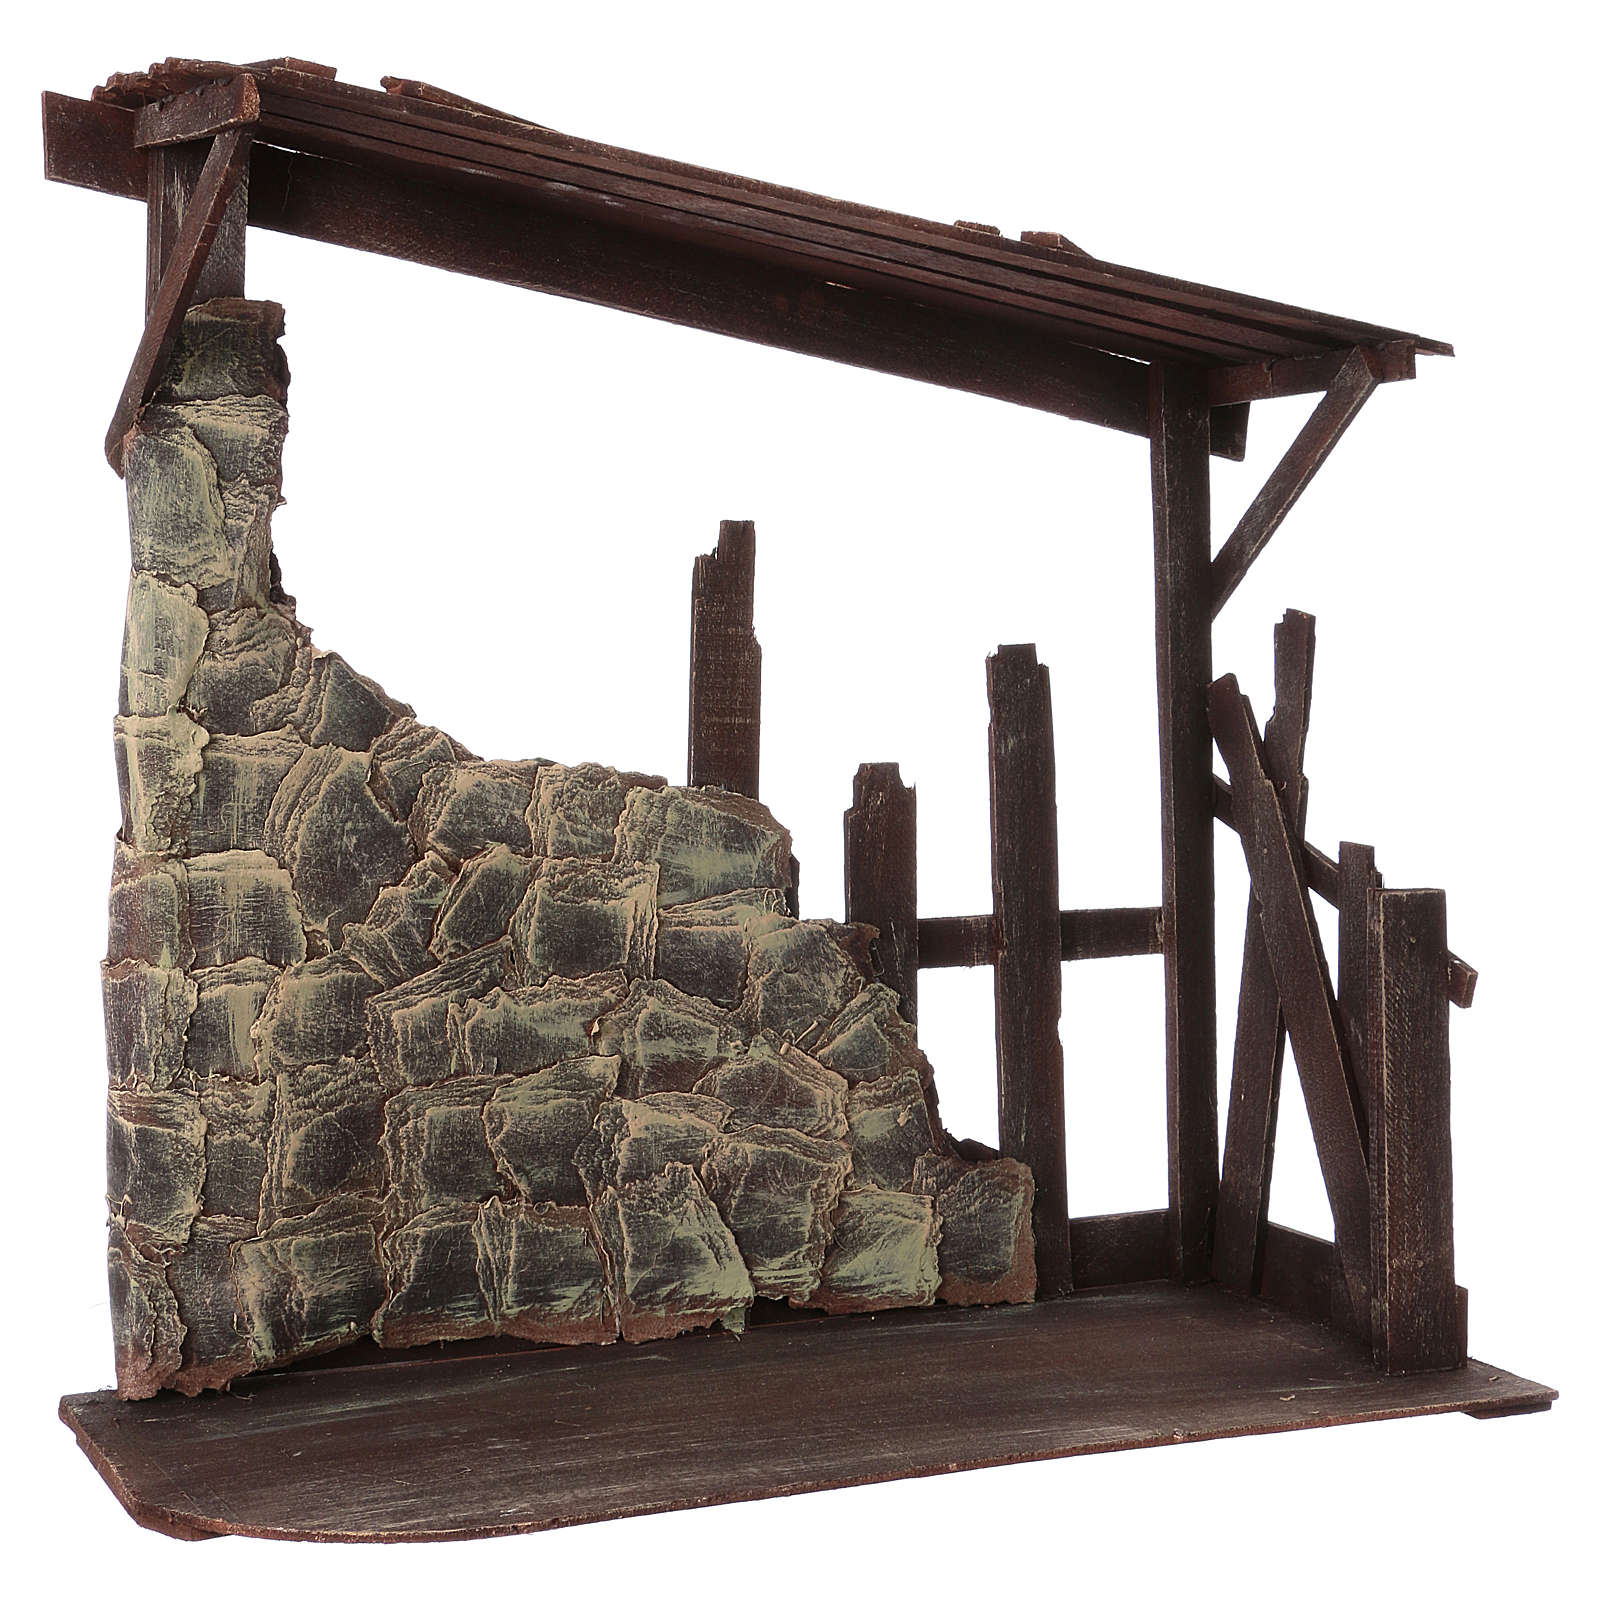 Capanna in legno dimensioni 60x70x30 cm per presepe 50 cm  4